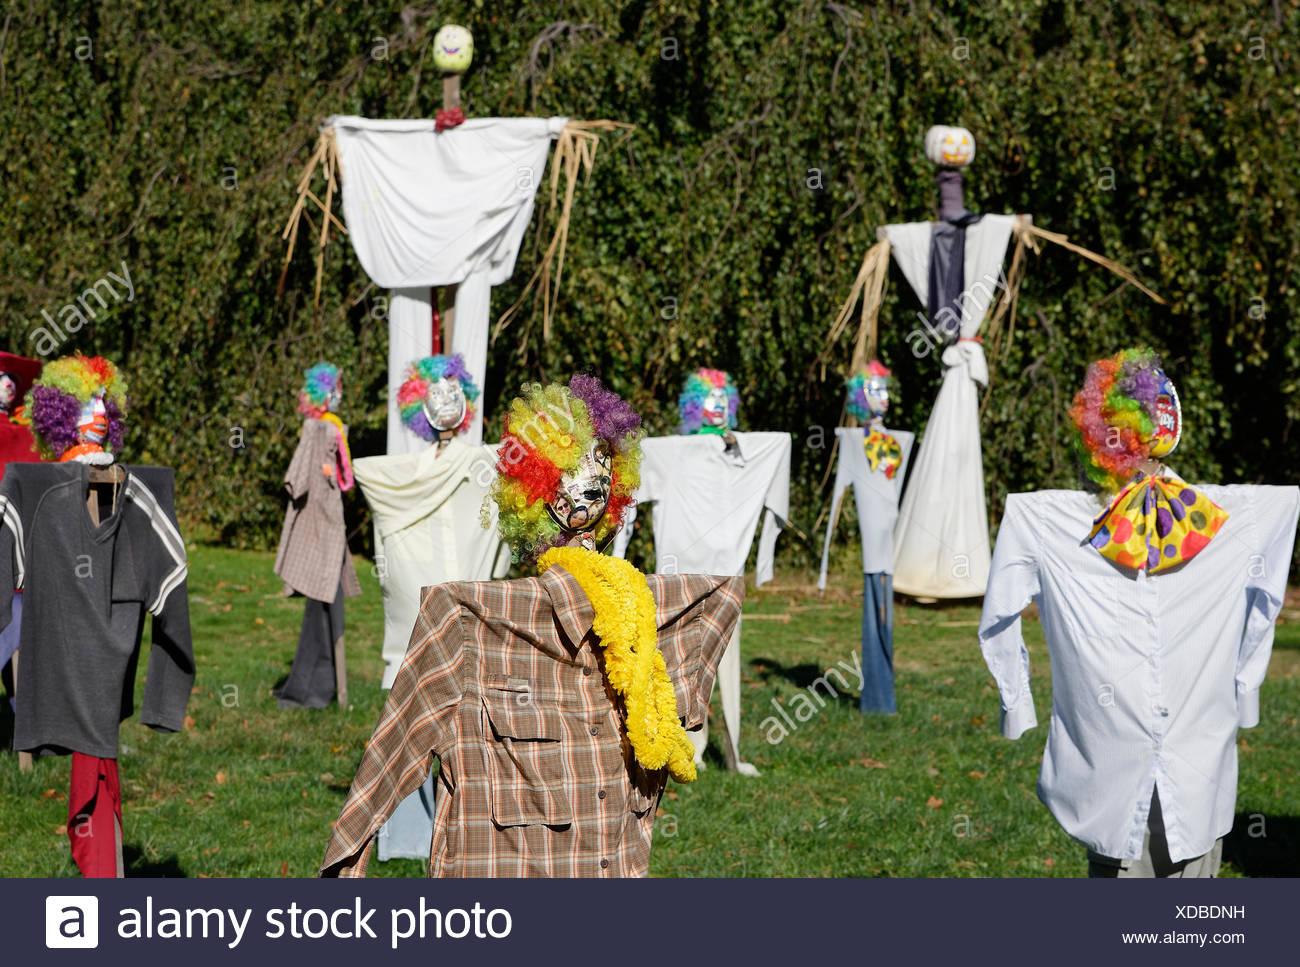 Scarecrow competition, Tarrytown, New York, USA - Stock Image